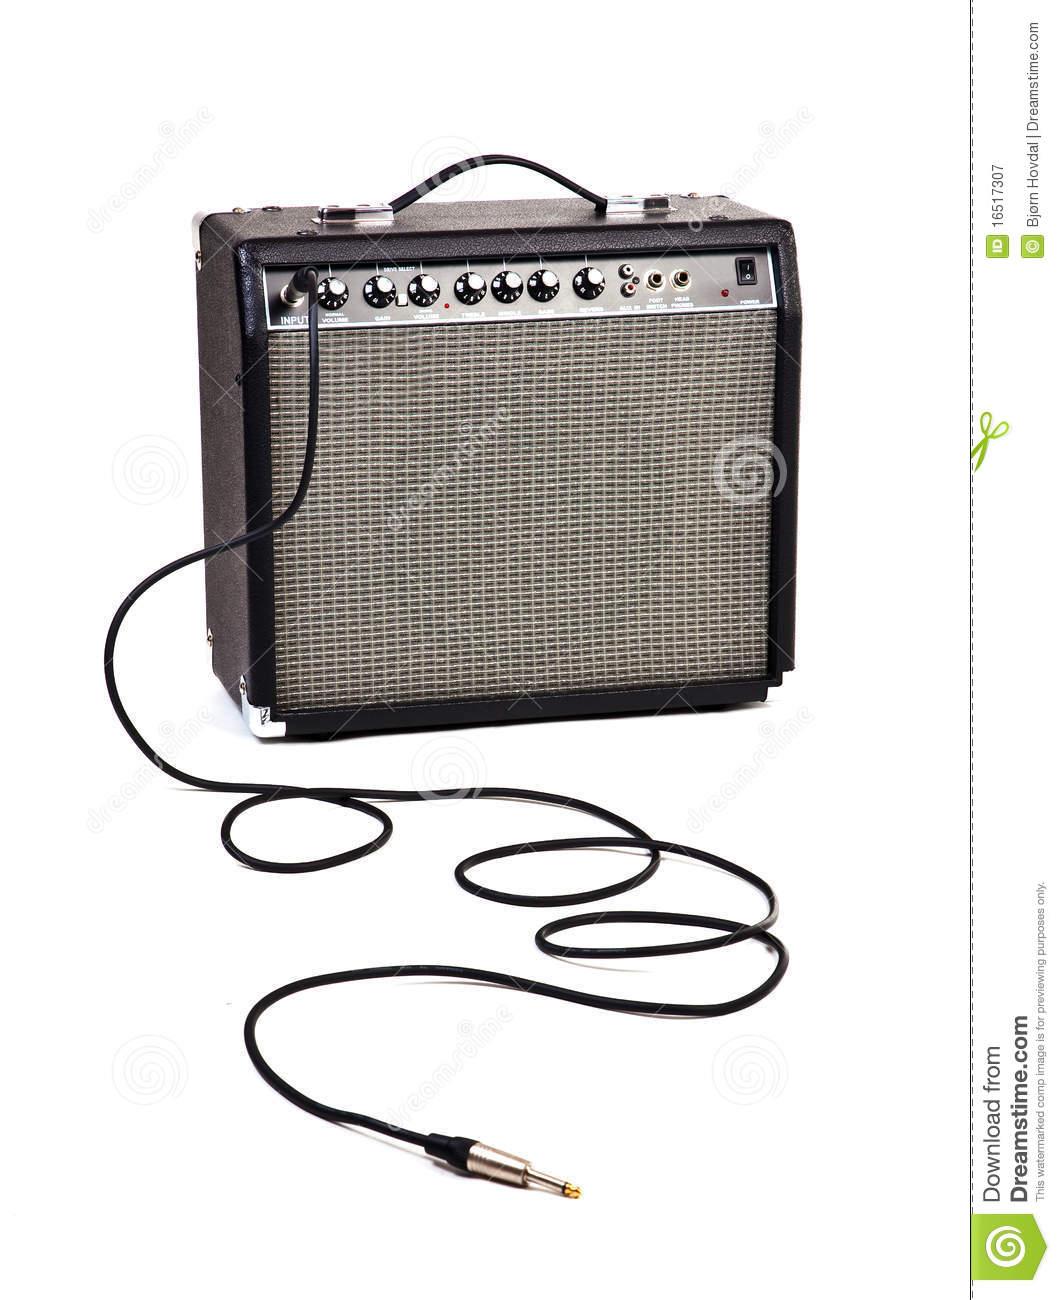 Cable Amplifier Clipart.